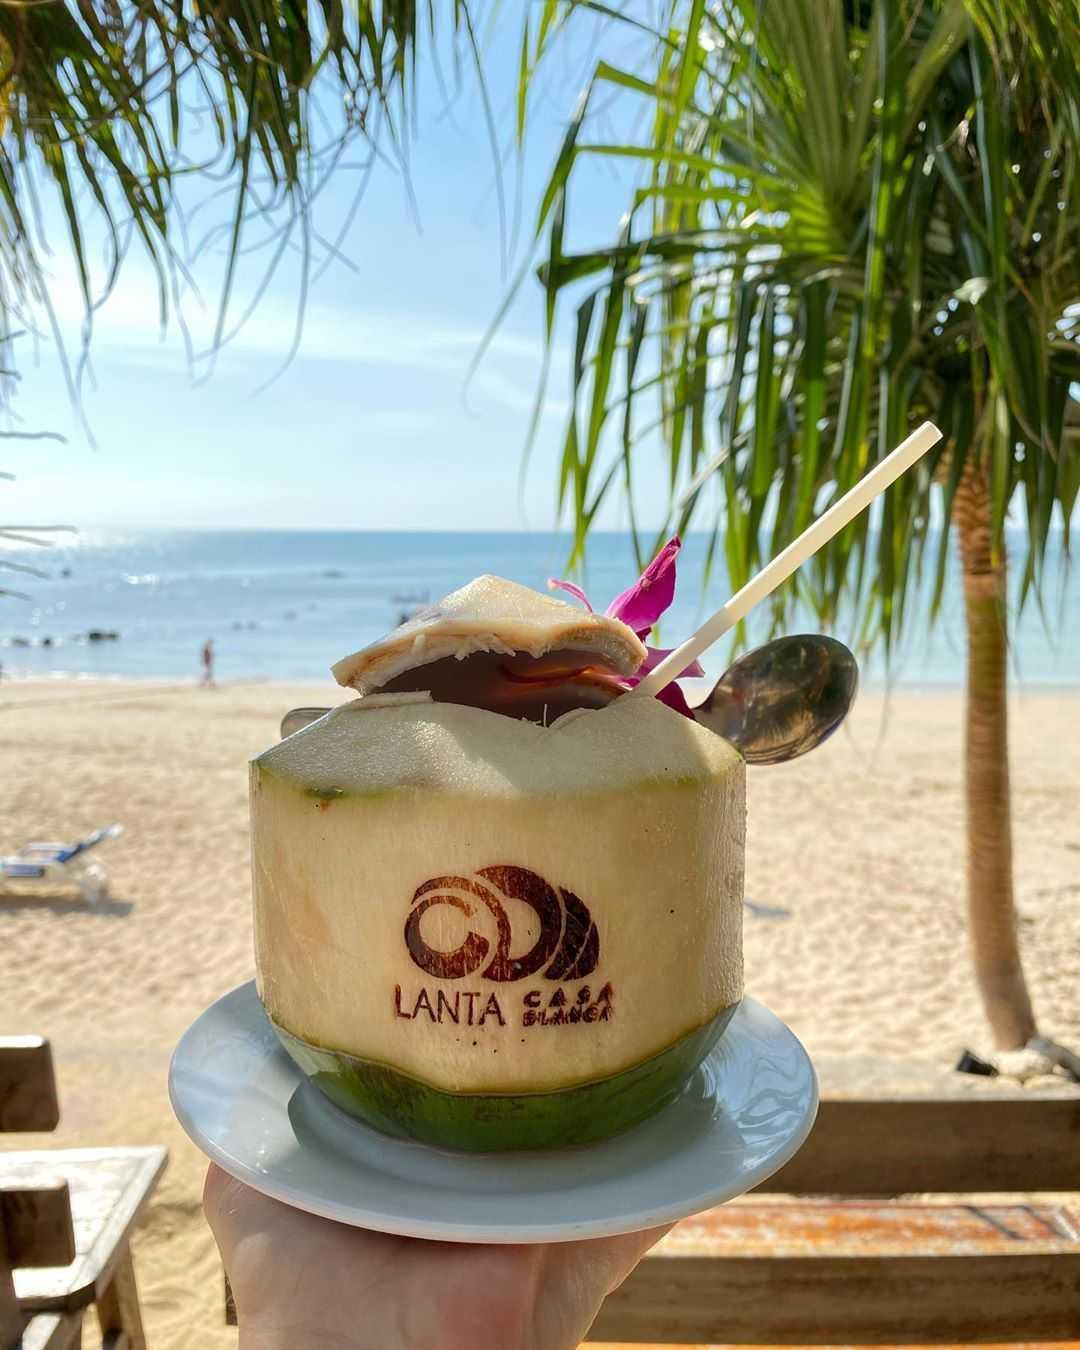 verse kokosnoot drinken bij Lanta Casa Blanca op Relax Beach (Koh Lanta)